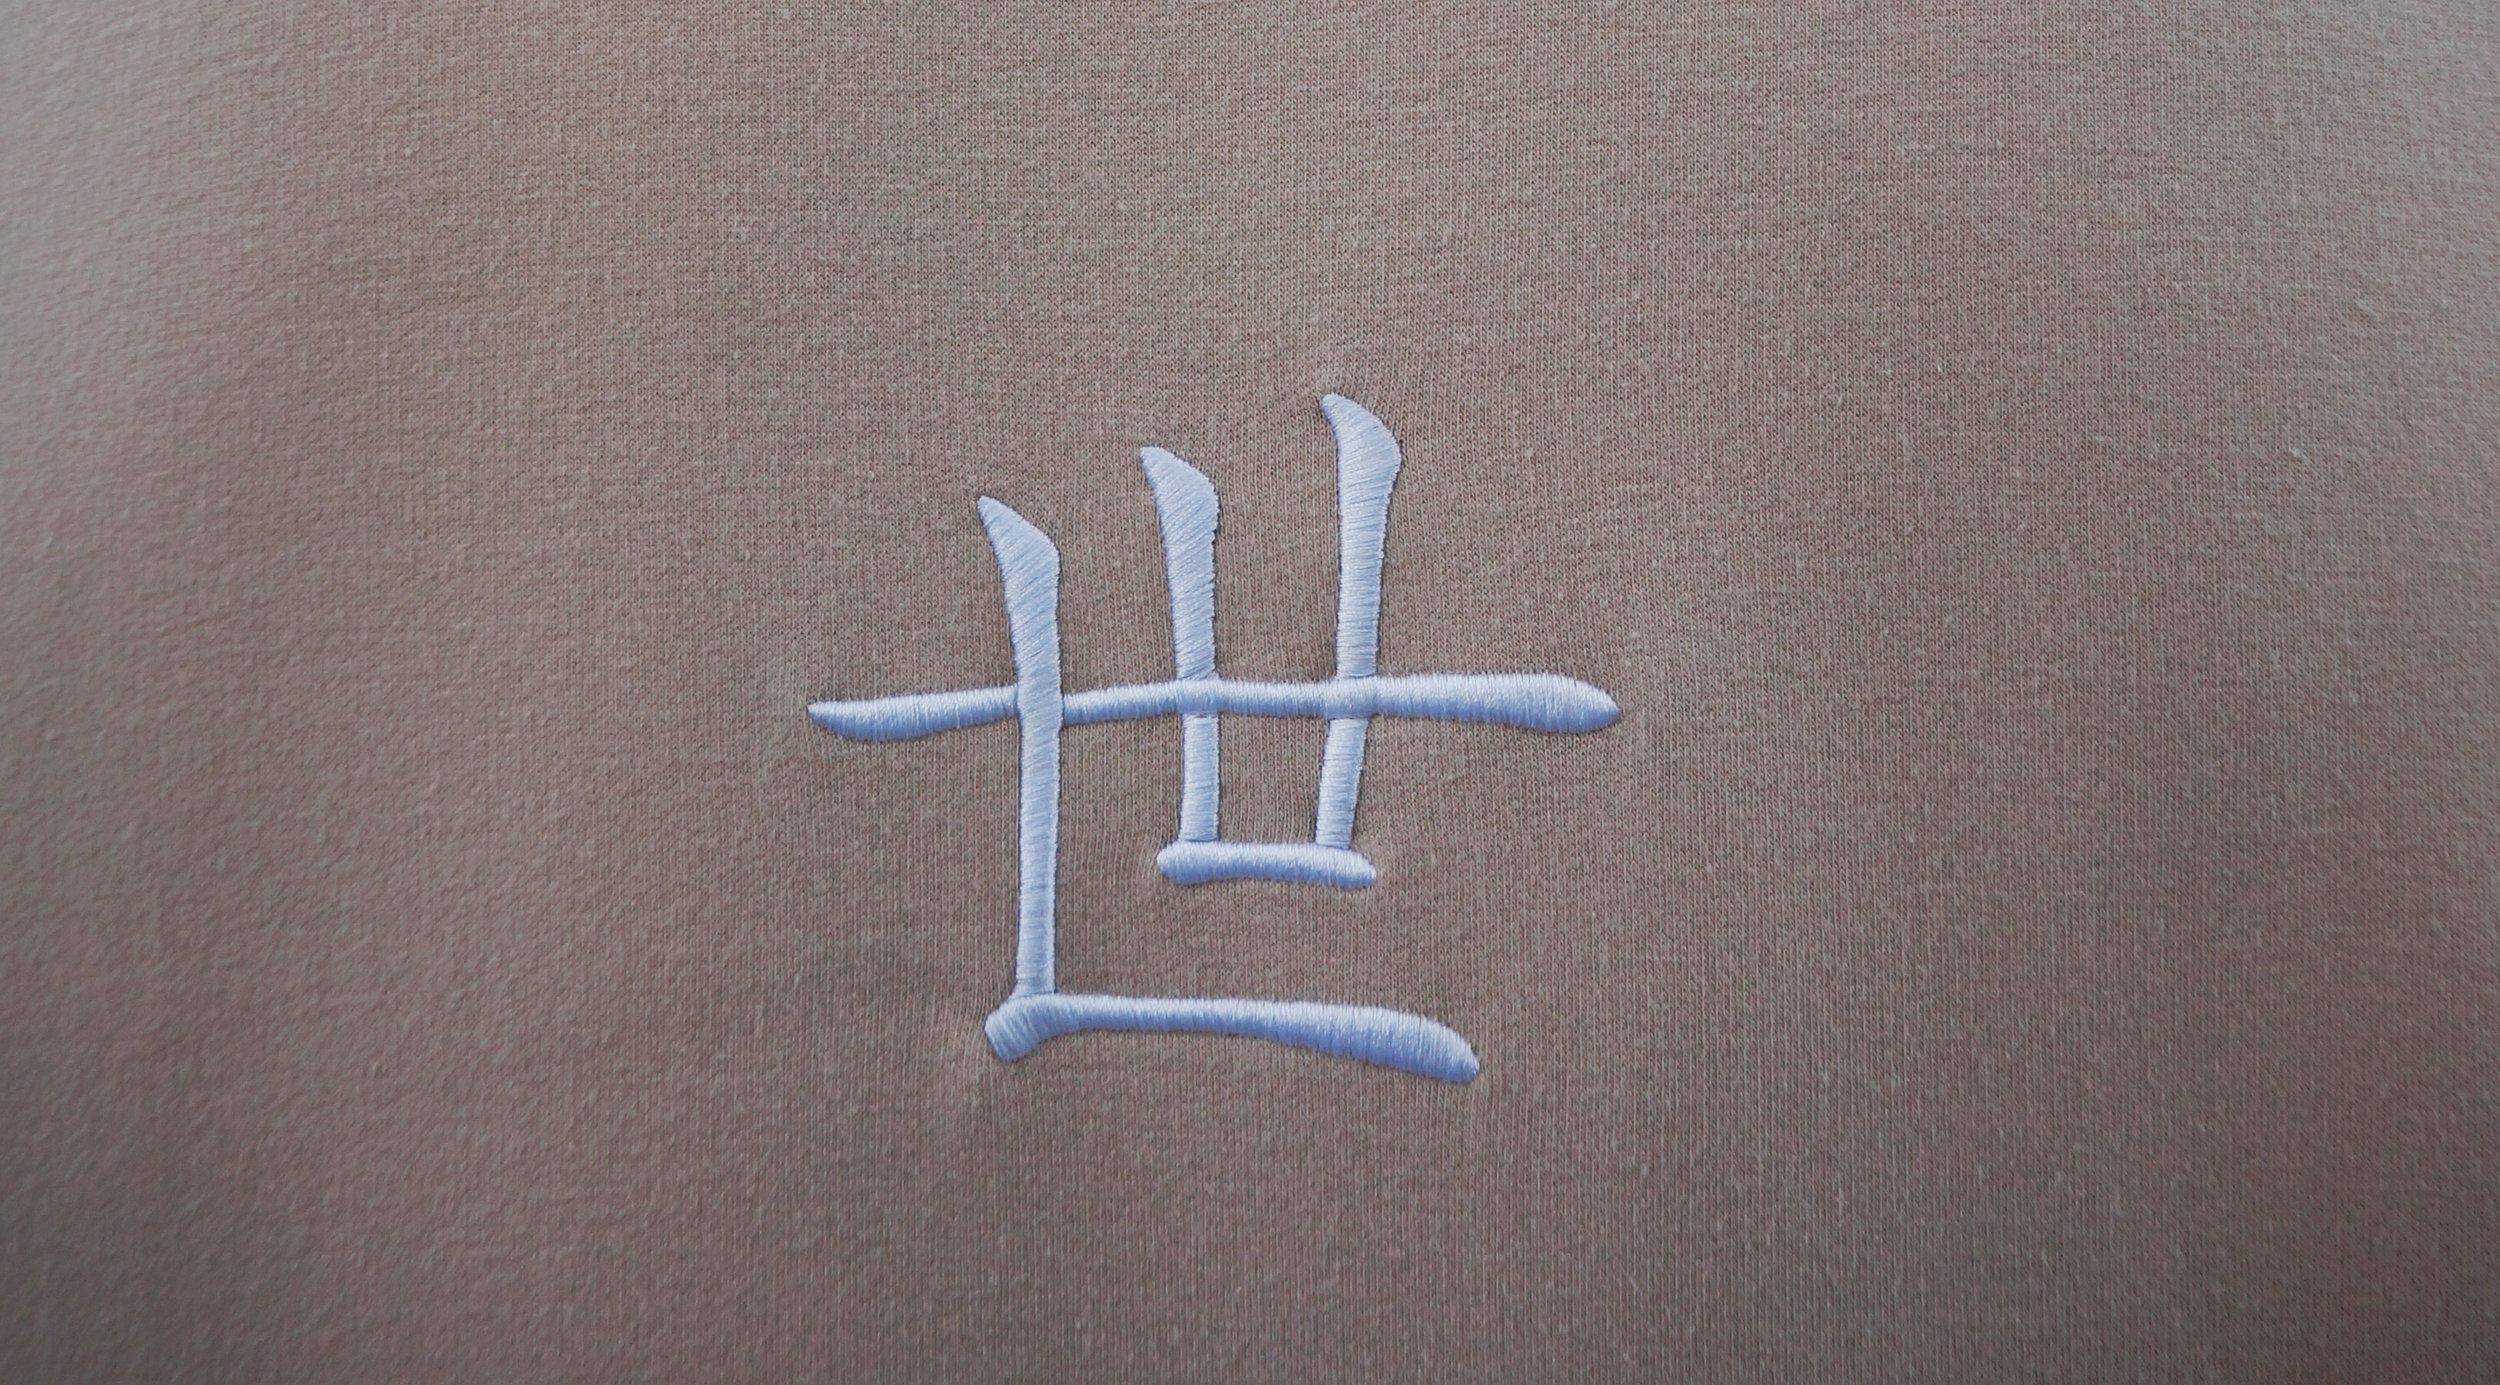 zai-level-fabric.jpg